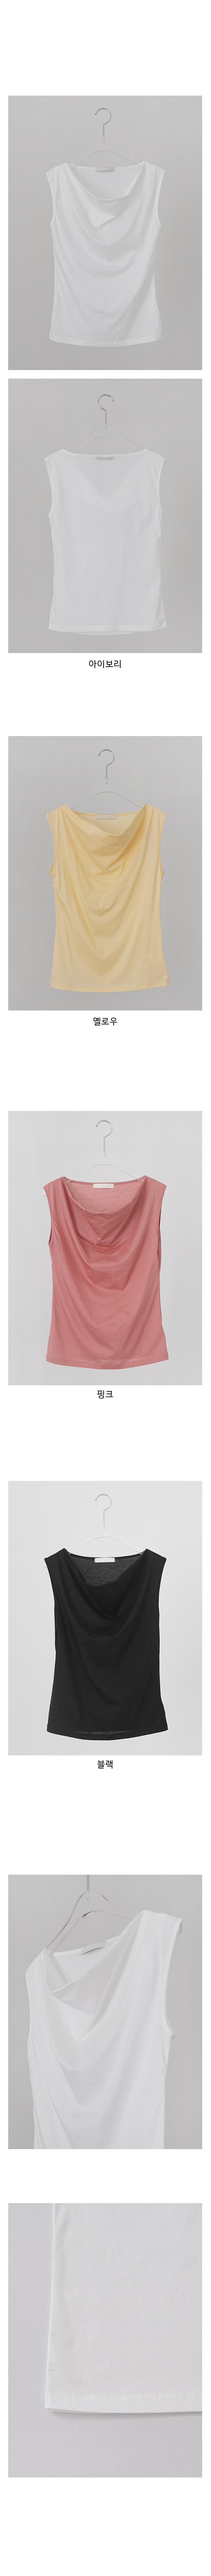 draped sleeveless top